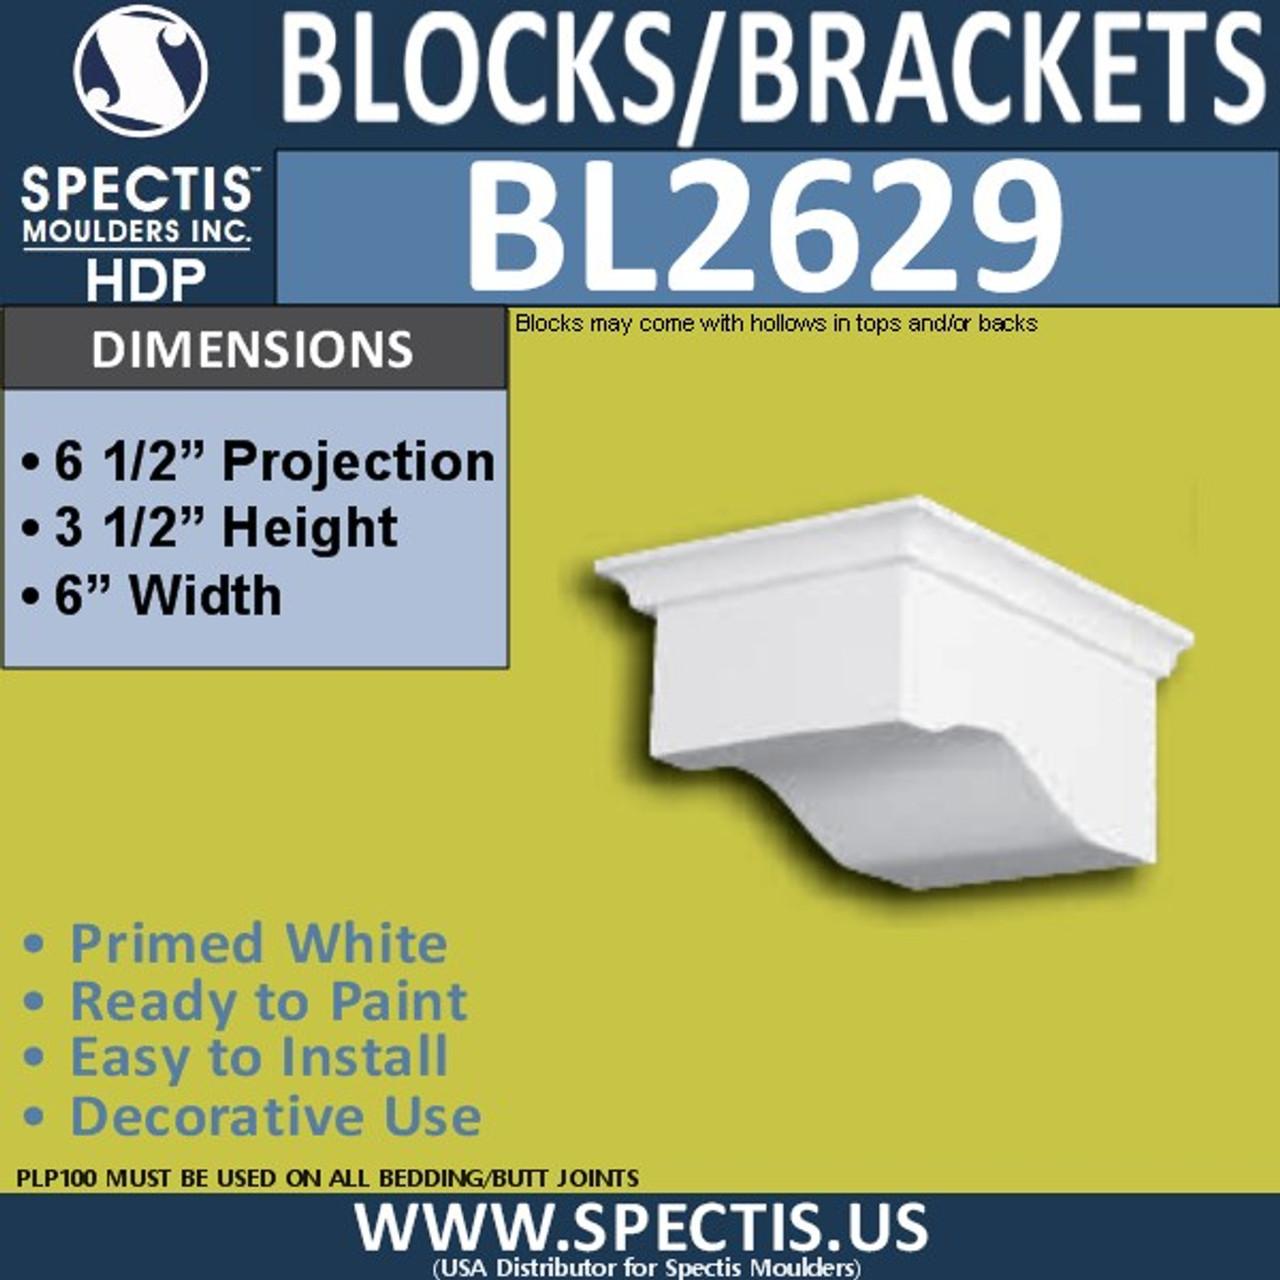 "BL2629 Eave Block or Bracket 6""W x 3.5""H x 6.5"" P"